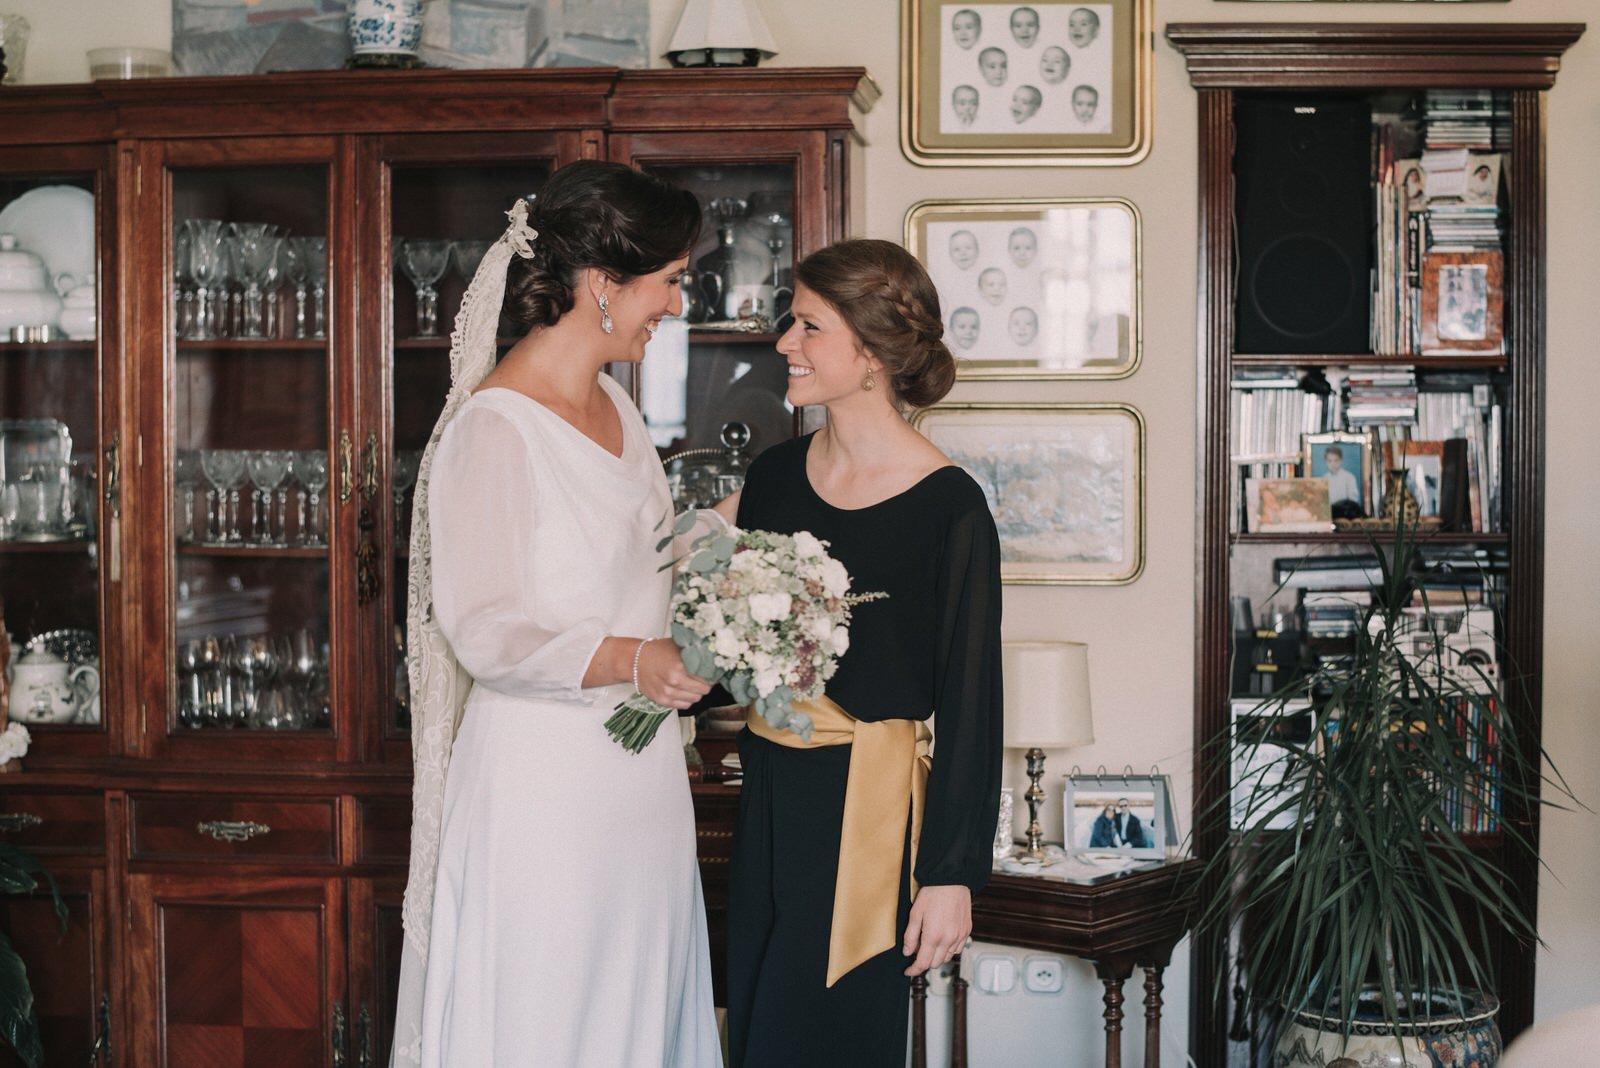 fotografo de bodas sevilla - fotografo boda - fotografía sevilla - Andrés AmarilloAAA_4572- tele- fine.JPG